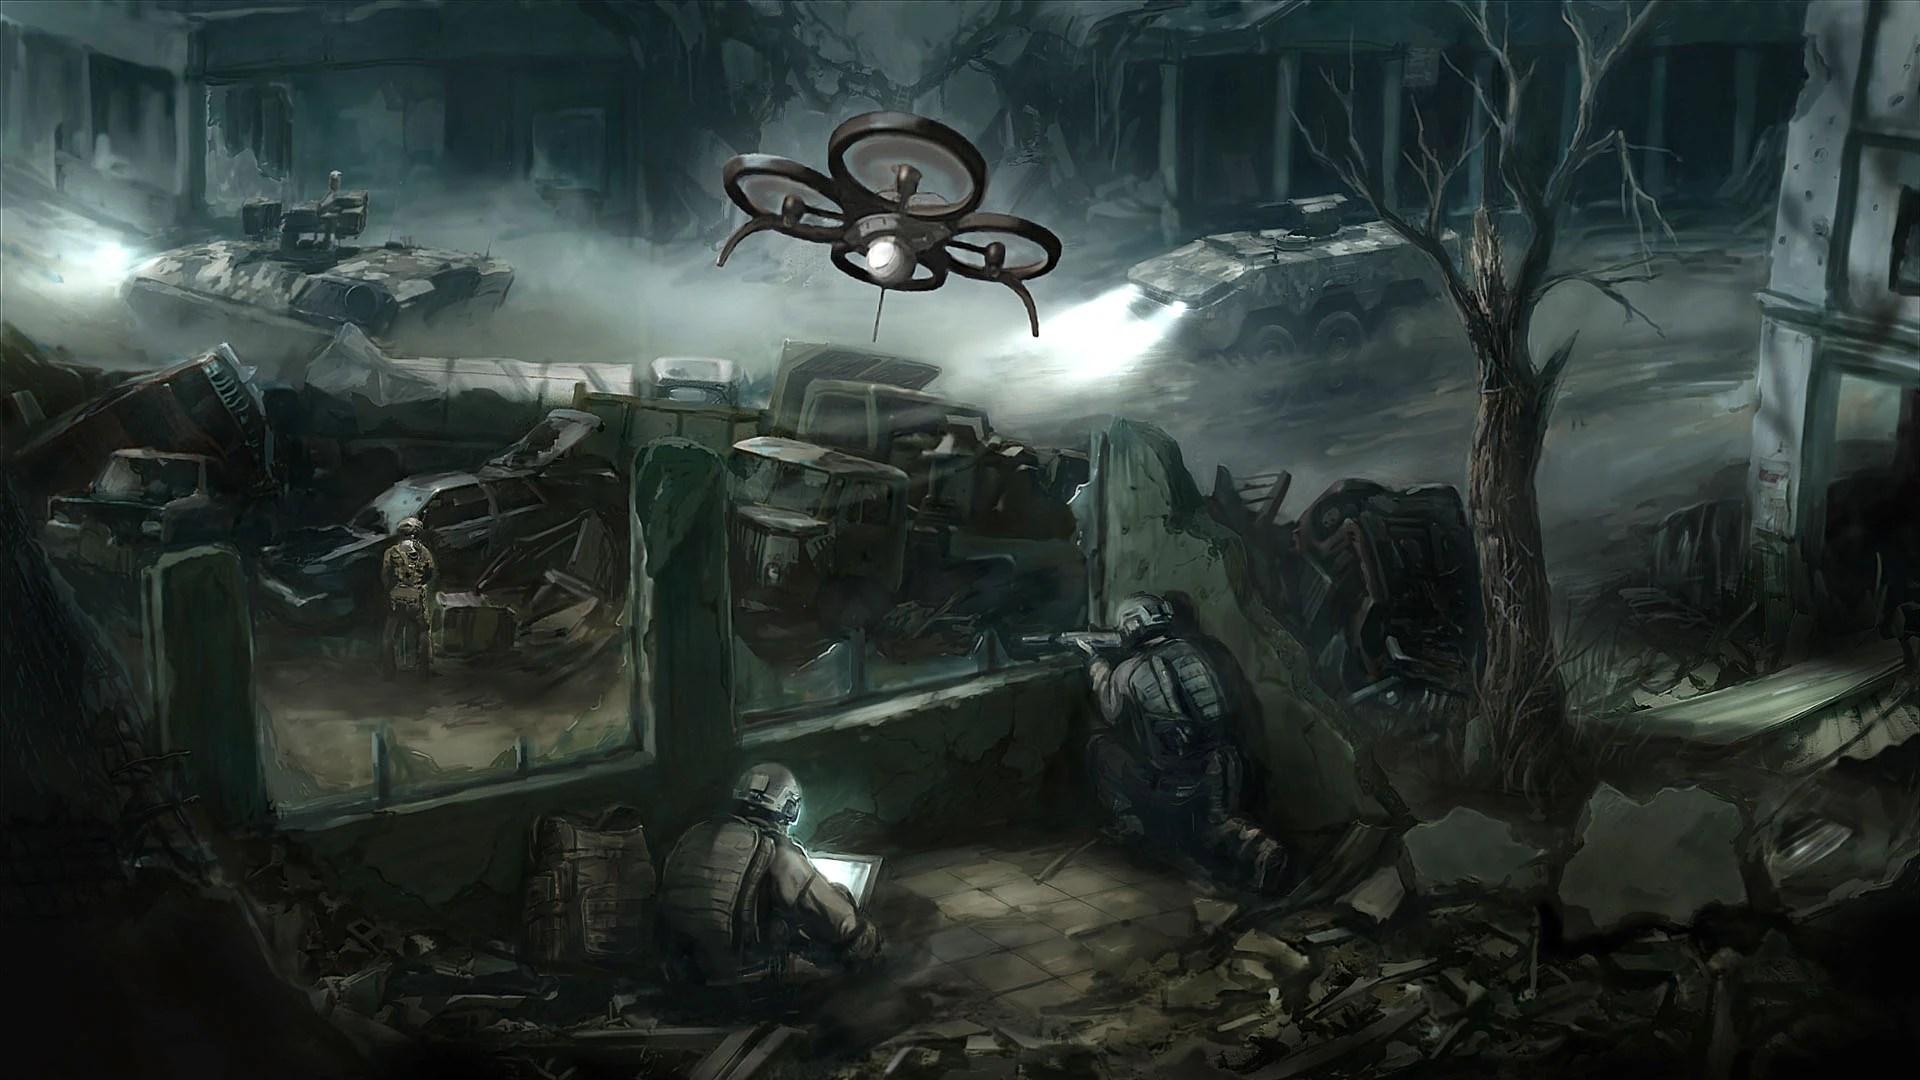 Resistance Fall Of Man Wallpaper Arma 3 Ar 2 Darter Steam Trading Cards Wiki Fandom